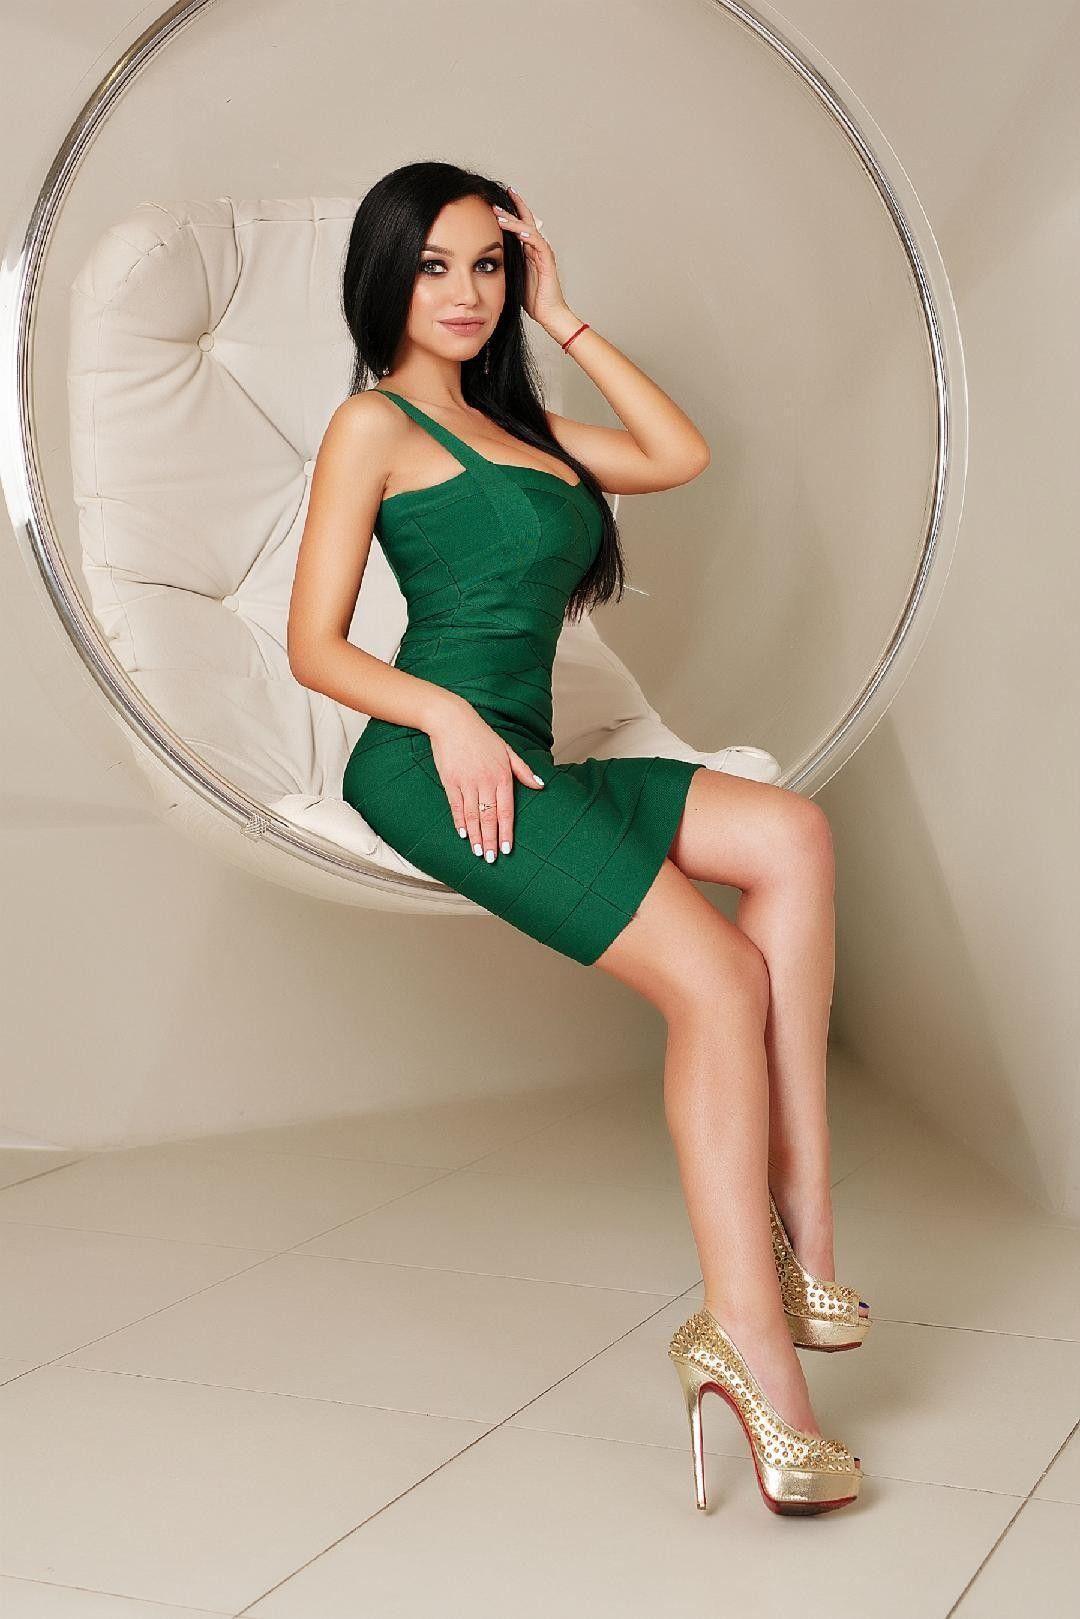 Ukraine Woman Sites Leading Sexy - Milf Nude Photo